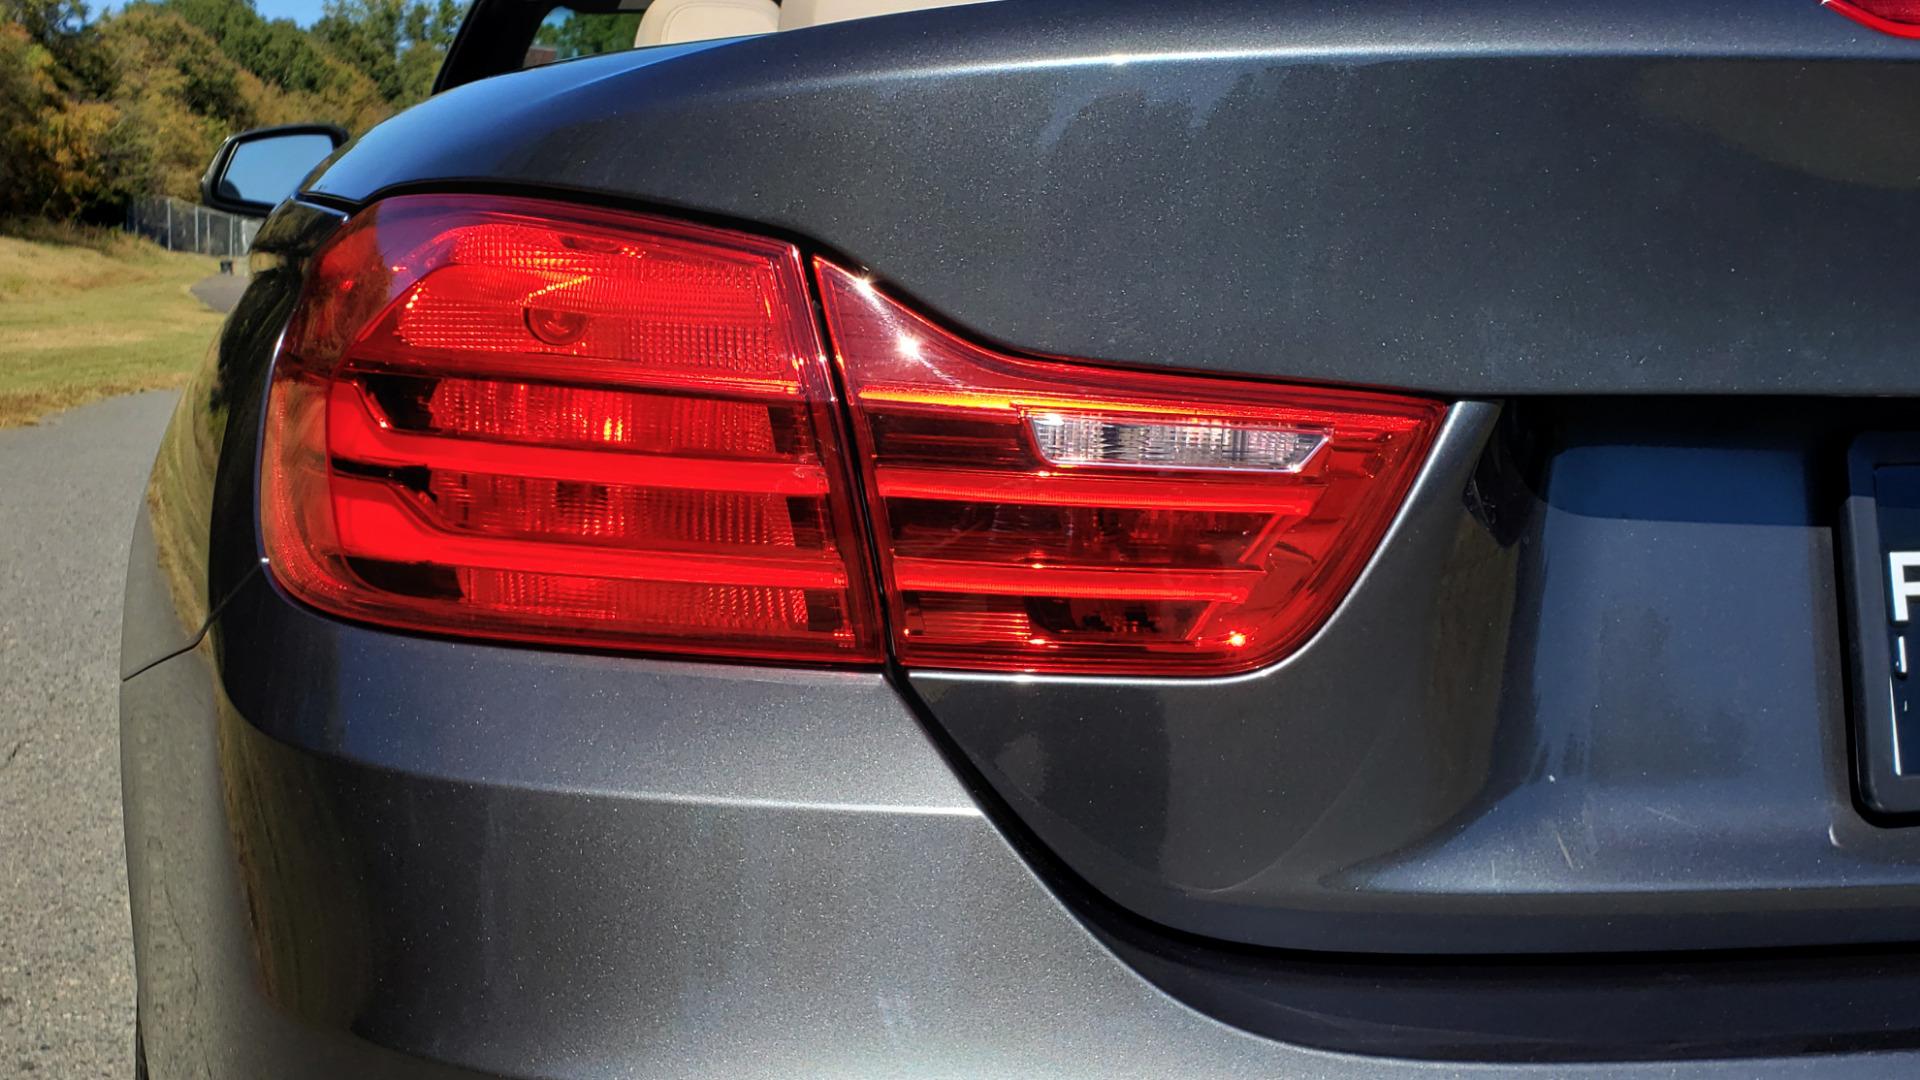 Used 2016 BMW 4 Series 428i / PREMIUM PKG / DRVR ASST / BACK-UP CAMERA for sale Sold at Formula Imports in Charlotte NC 28227 41